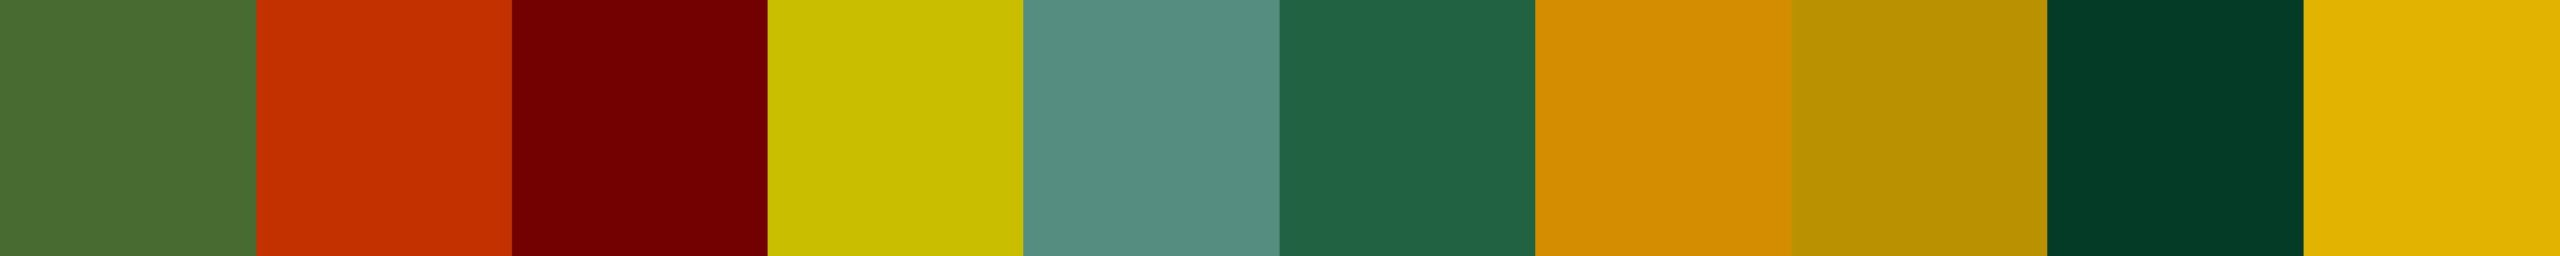 14 Krebola Color Palette